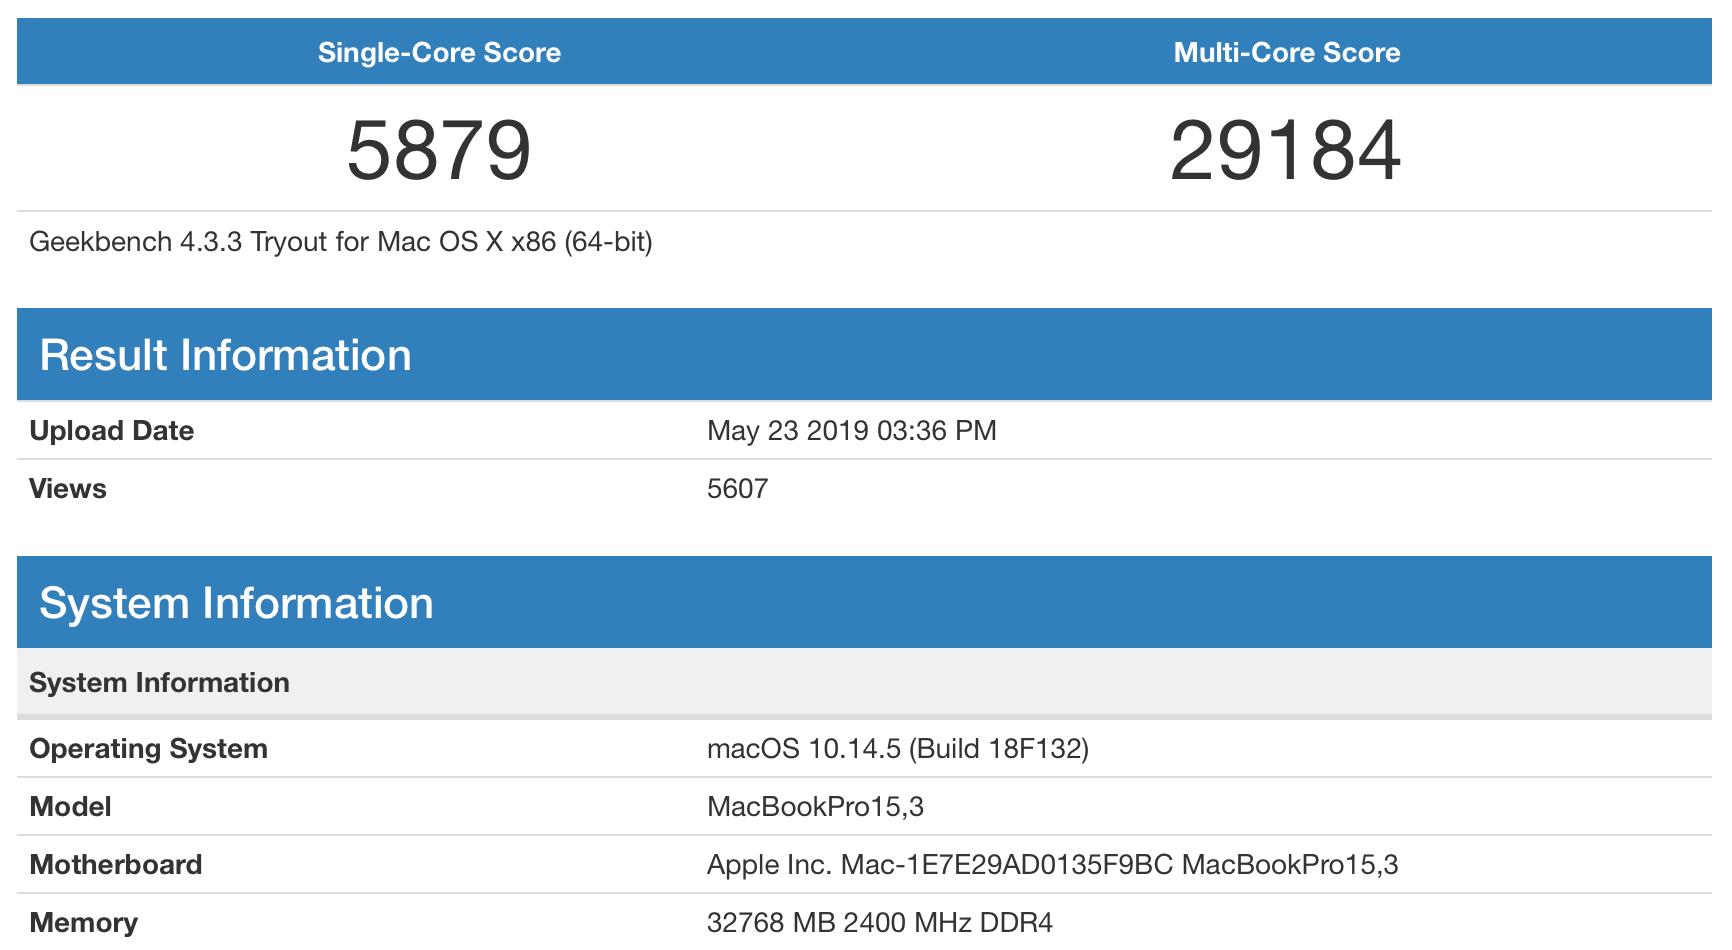 https://www.macfreak.nl/modules/news/images/zArt.MacBookPro8-coreGeekbenchScore.png